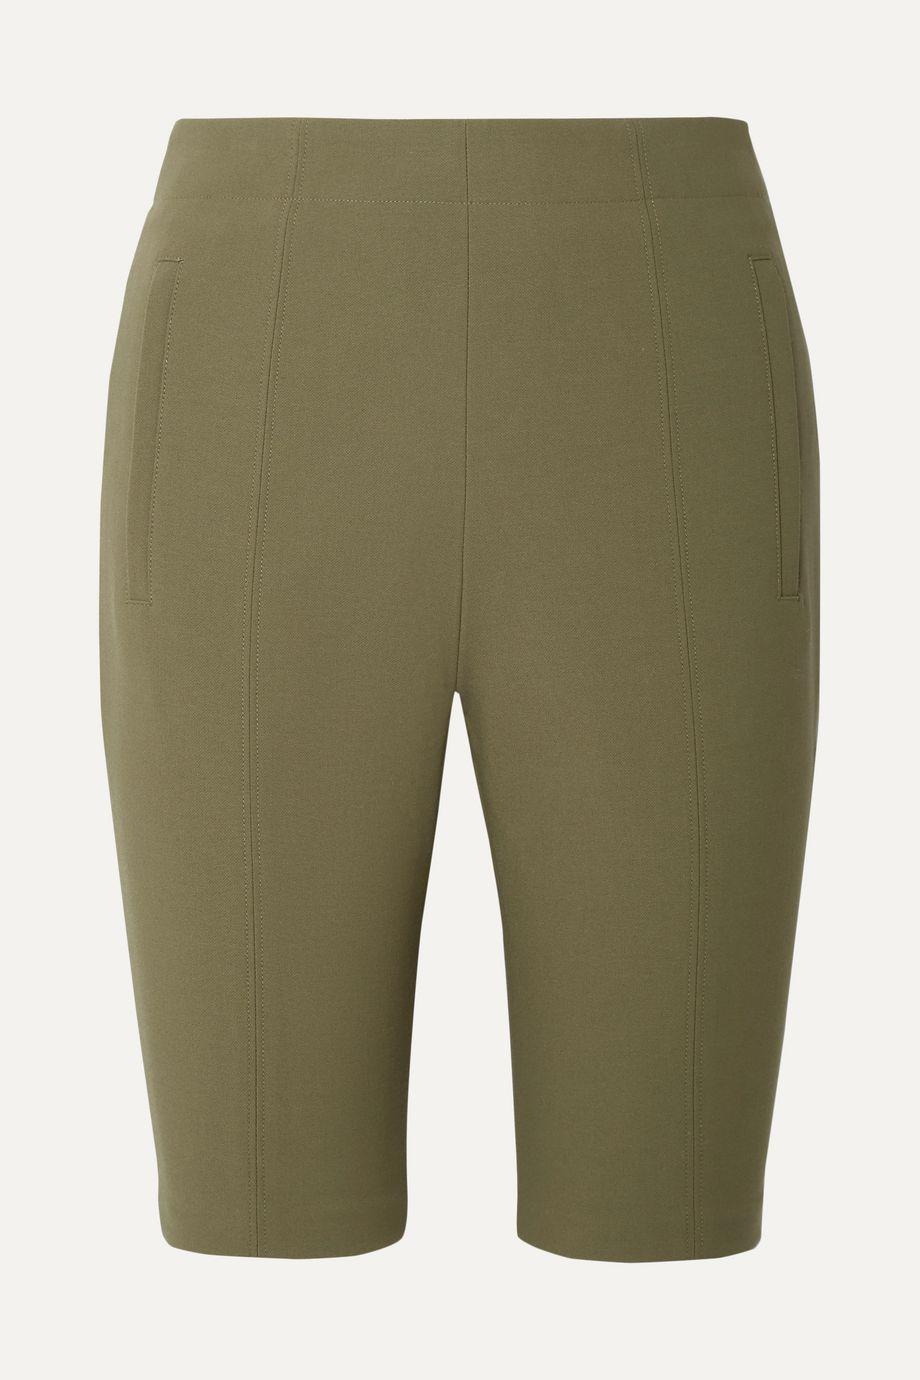 Tibi Anson ponte shorts